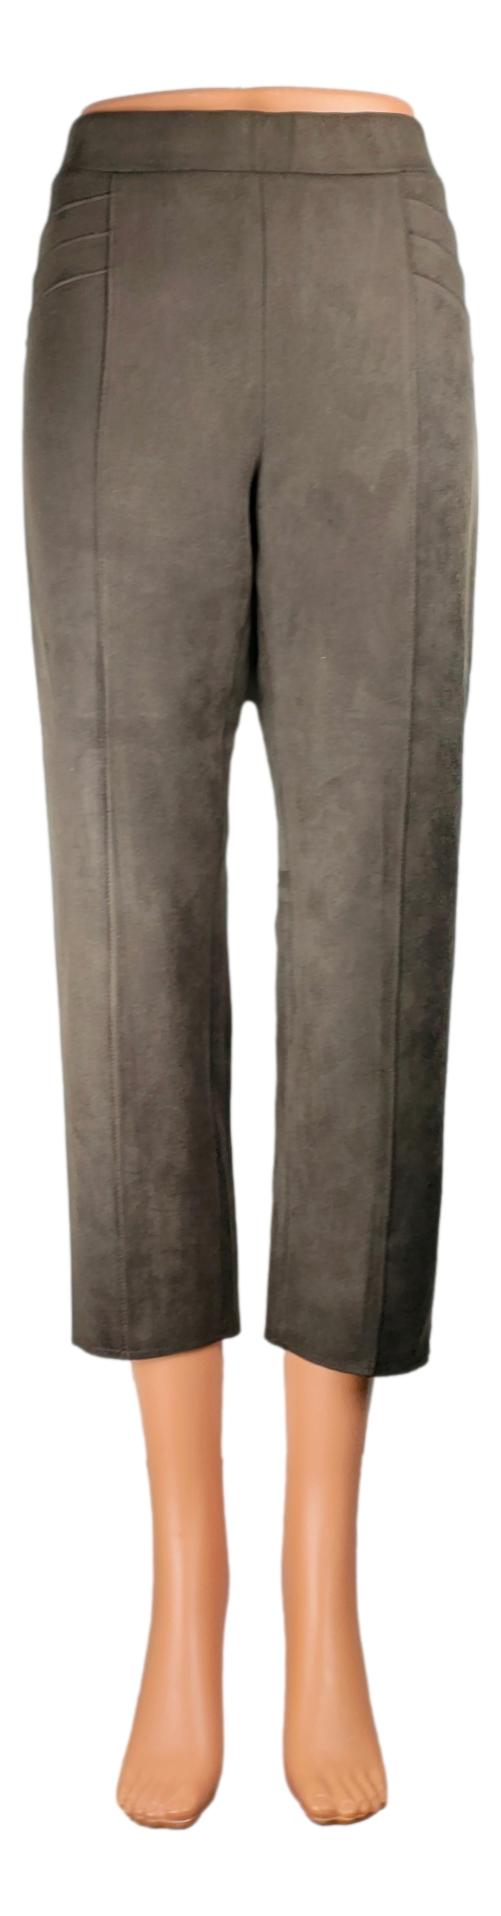 Pantalon Armand Thiery - Taille 40